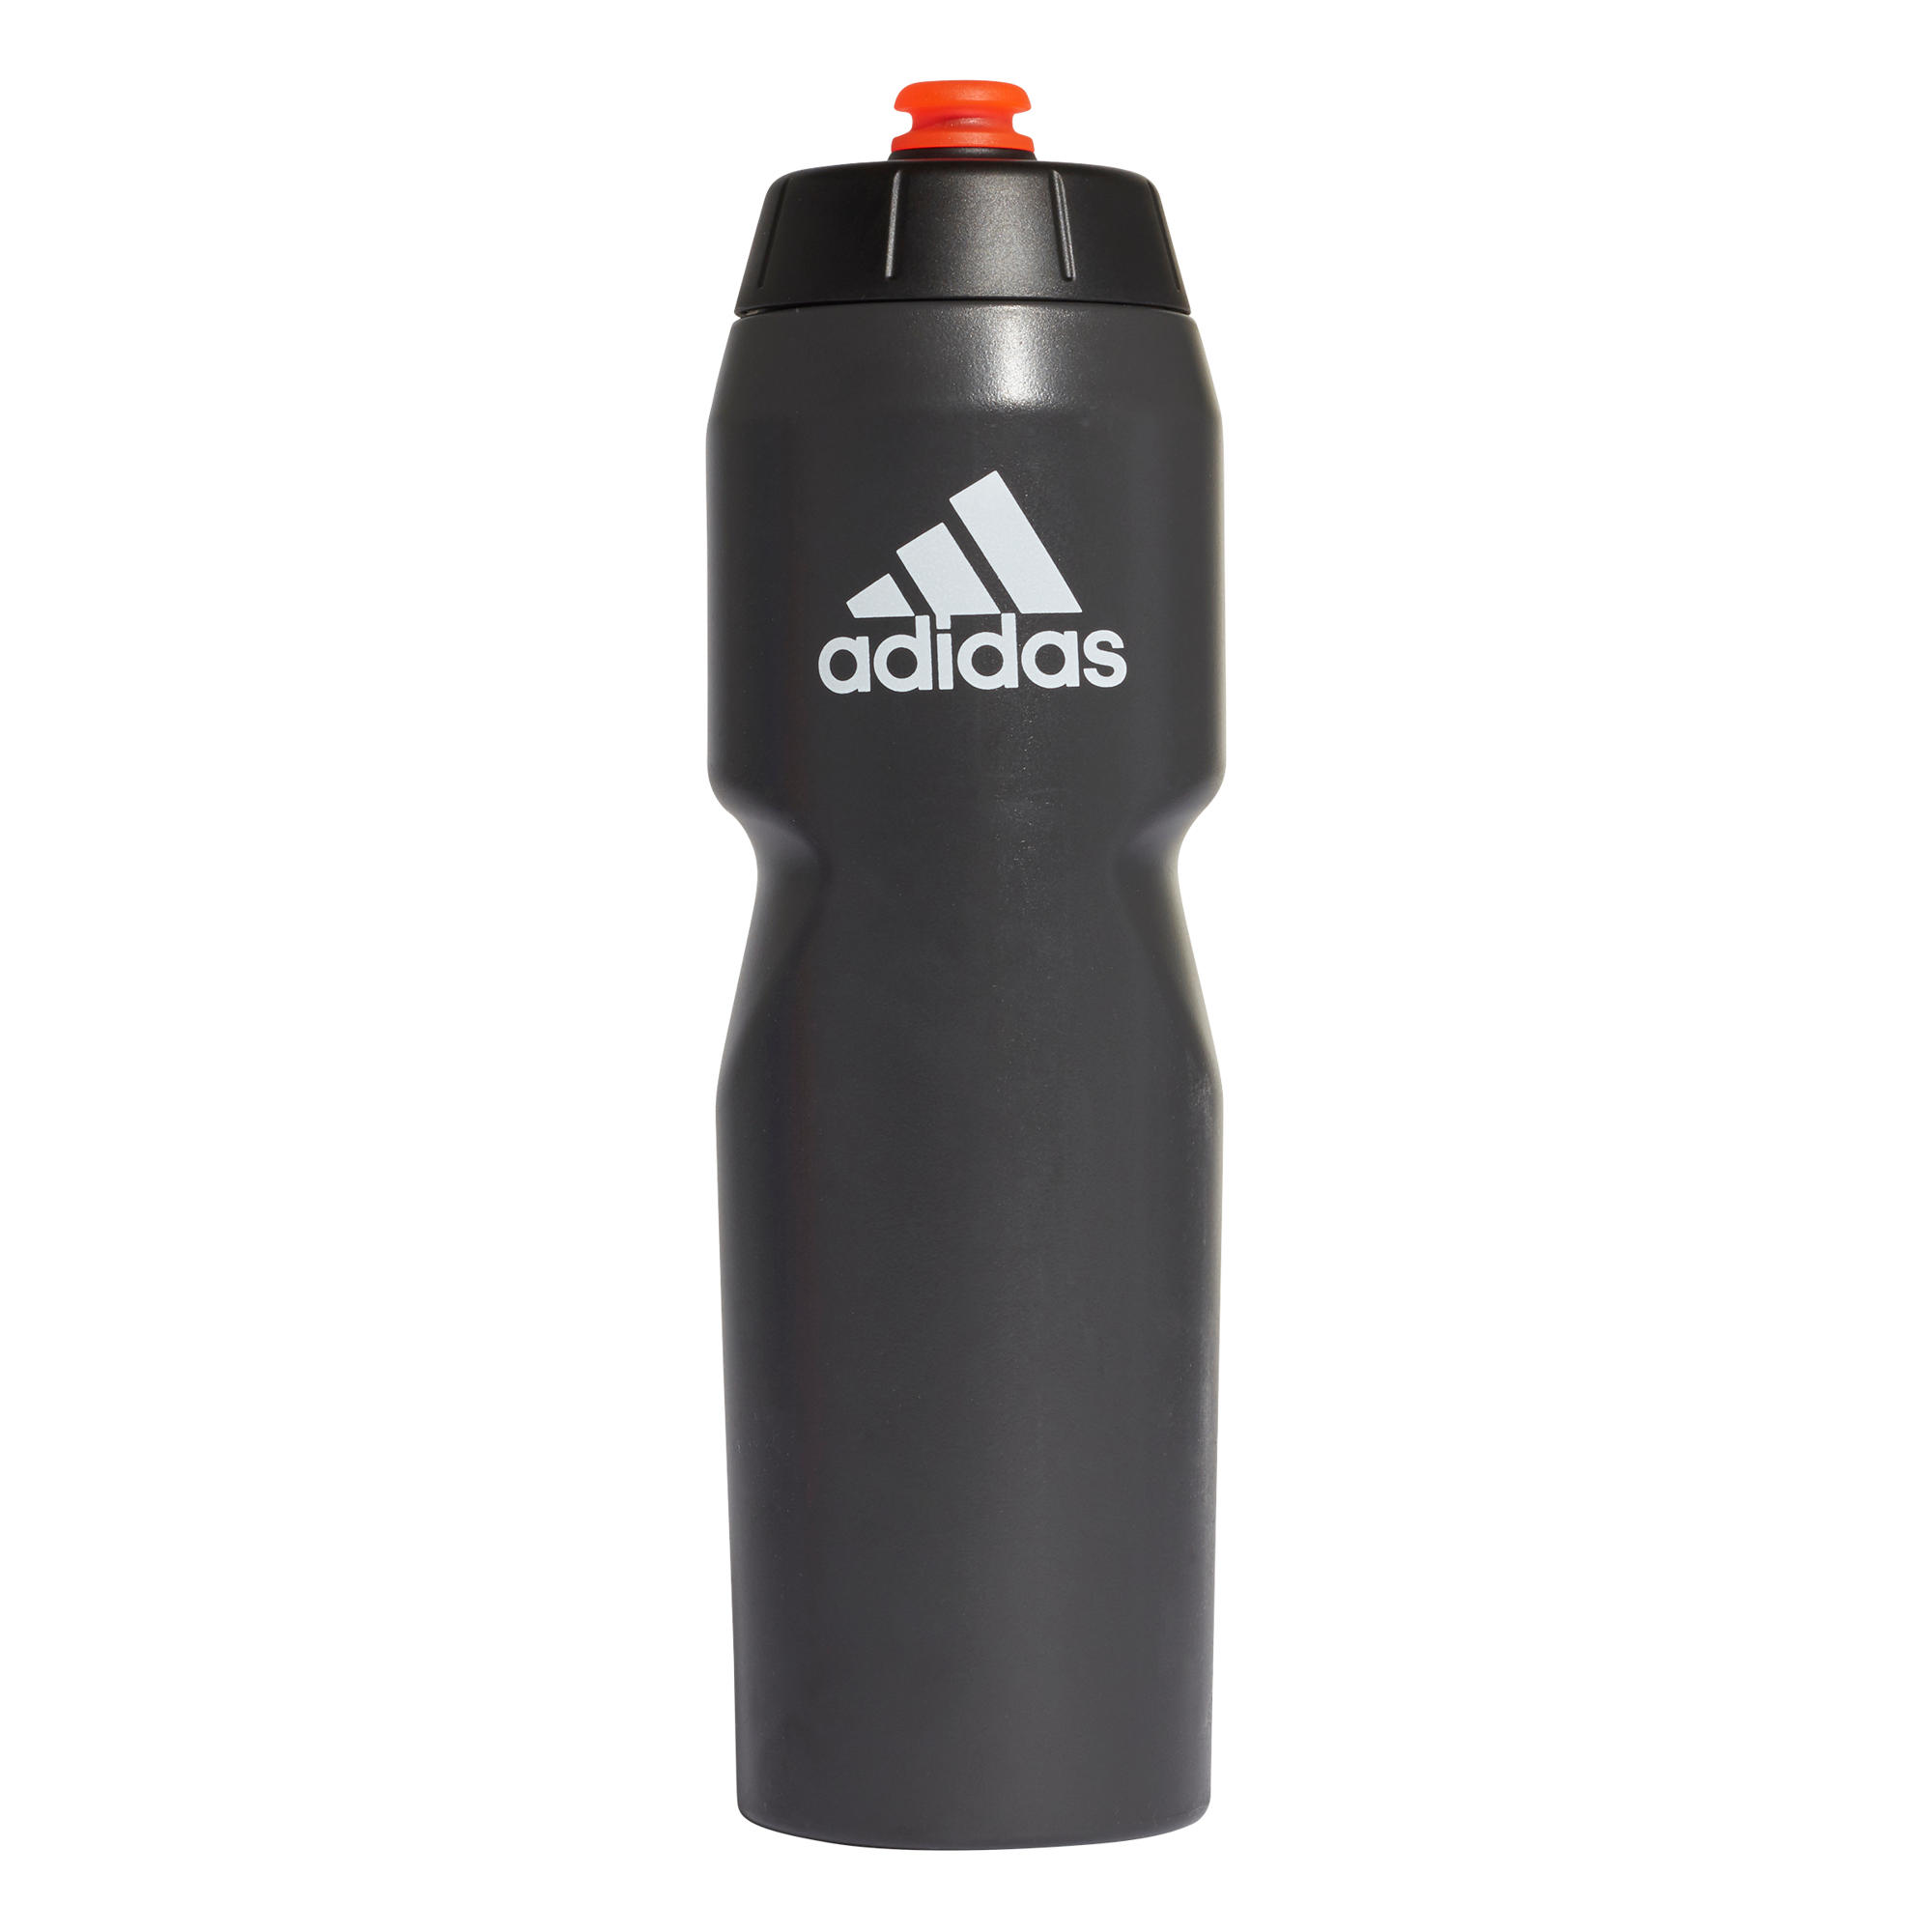 Bidon Adidas Fitness